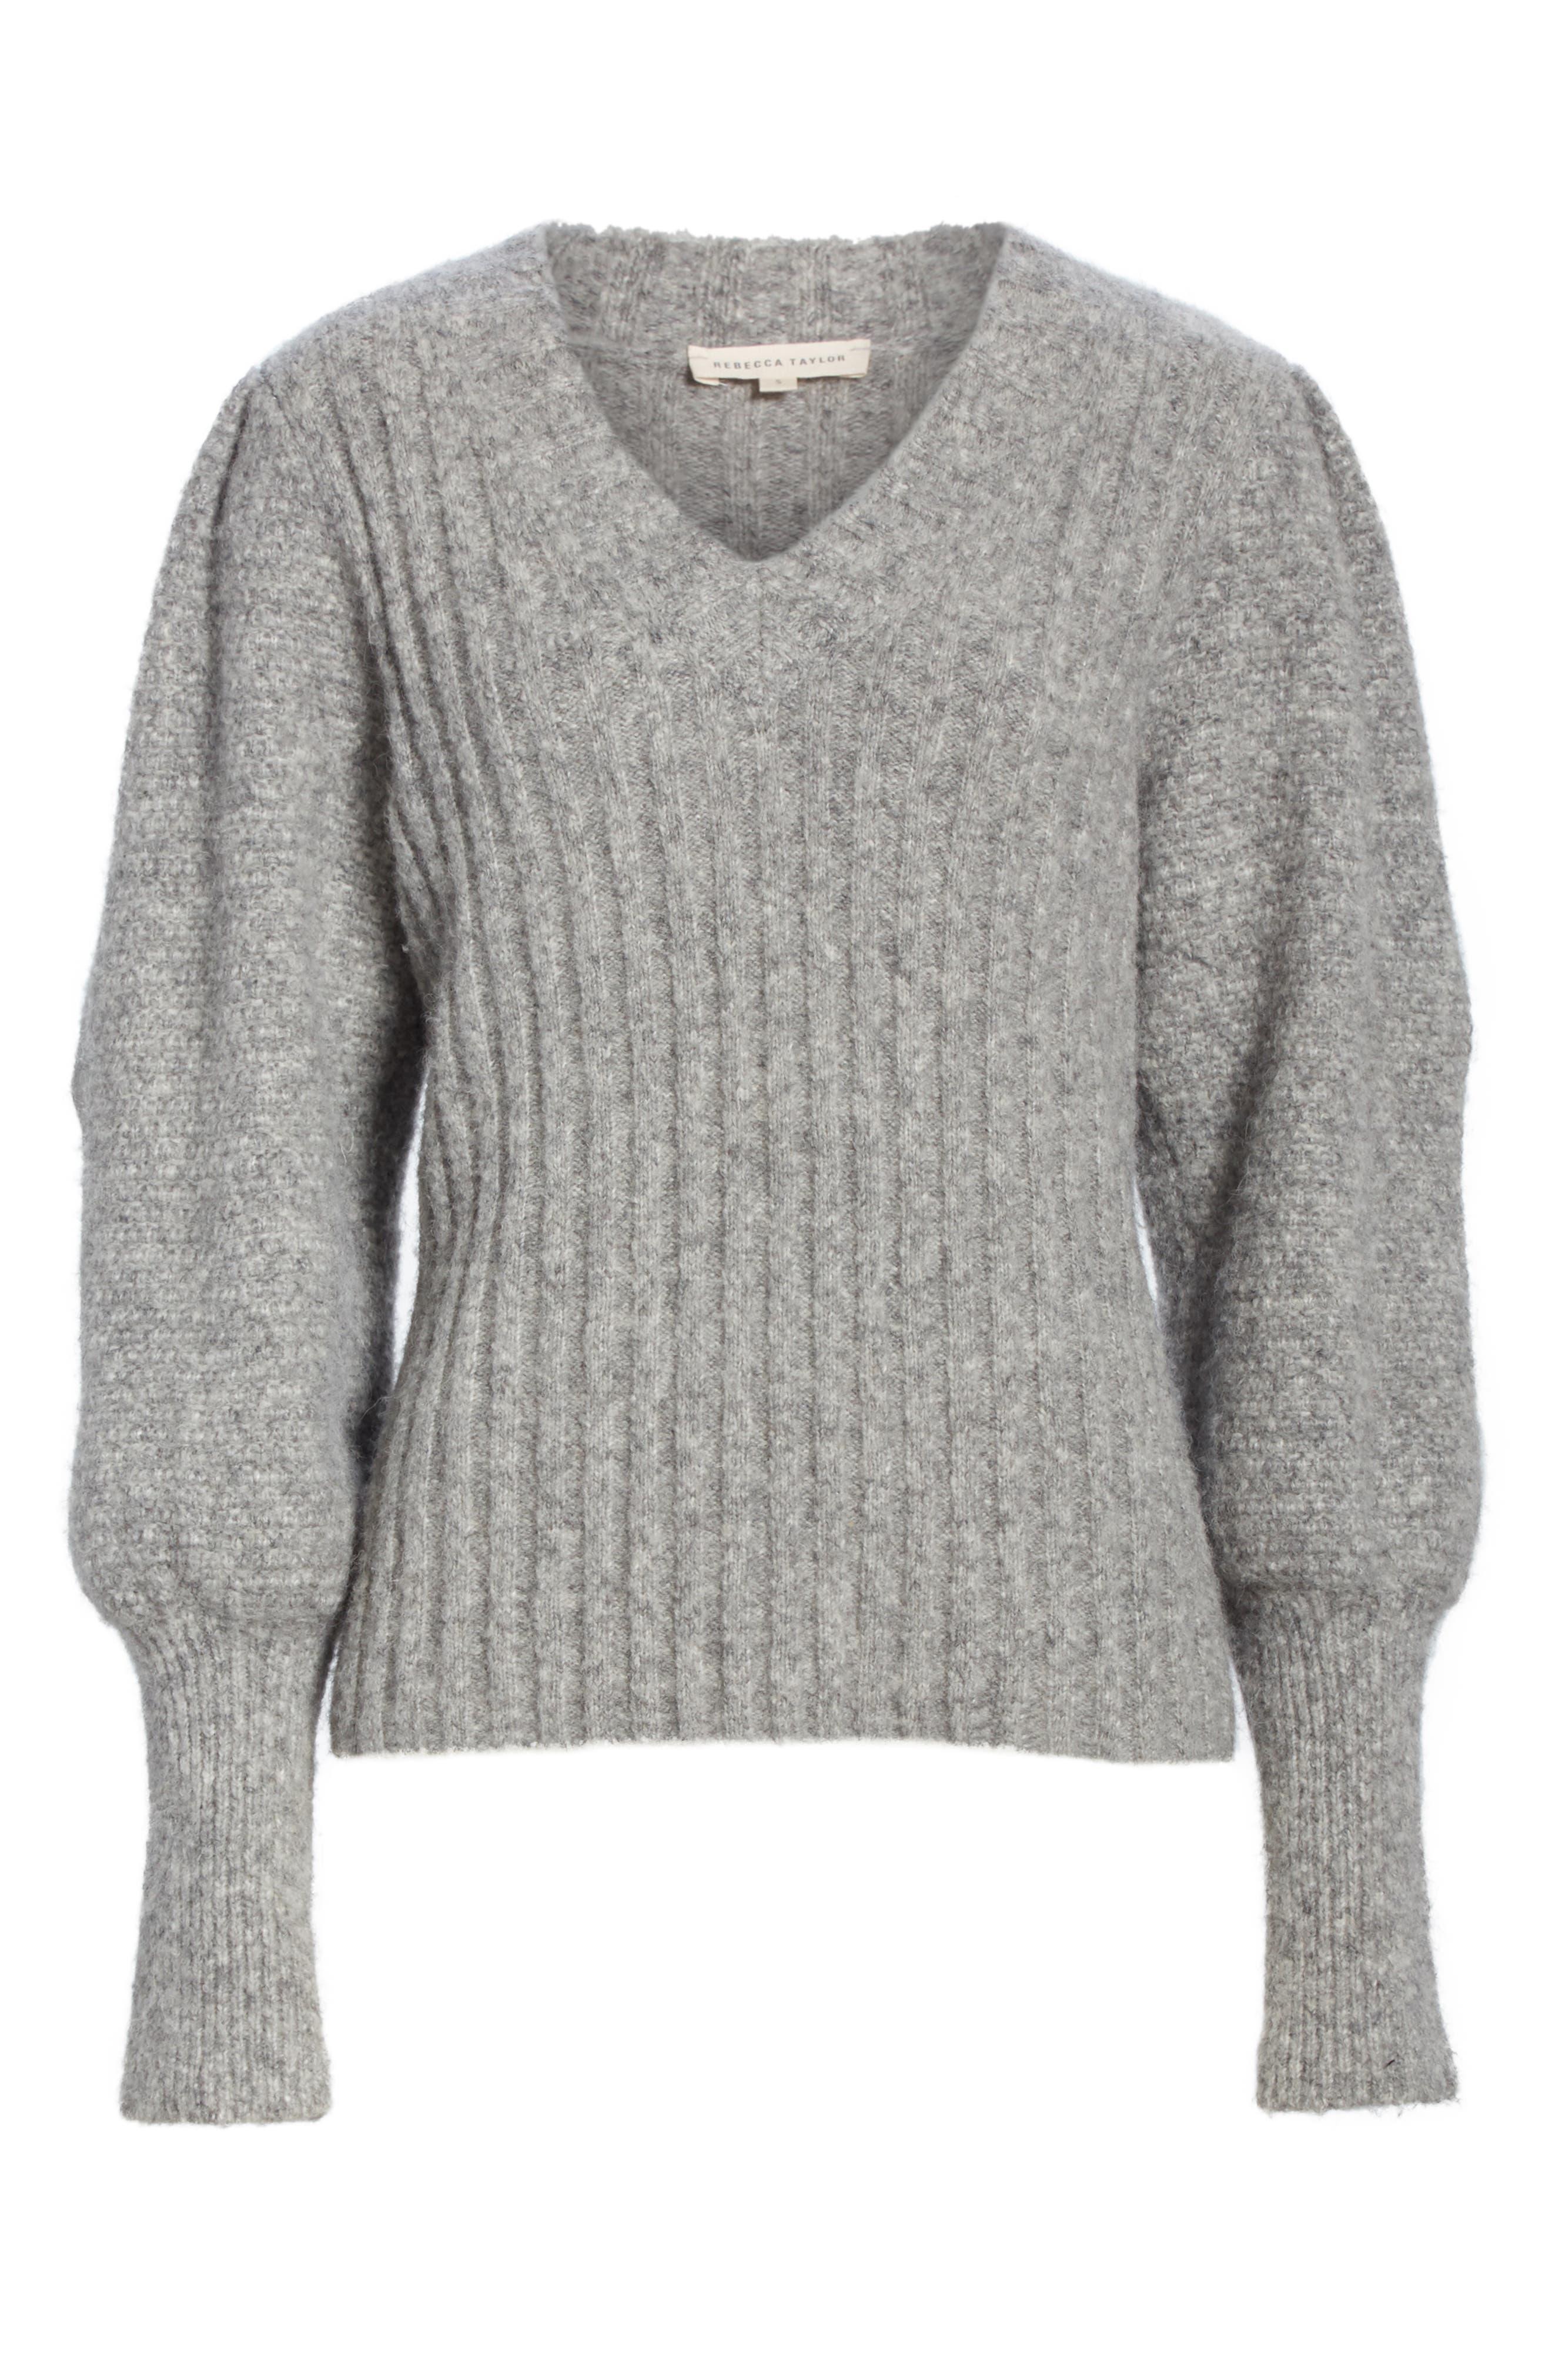 REBECCA TAYLOR,                             Lofty Alpaca Wool Blend Sweater,                             Alternate thumbnail 6, color,                             052